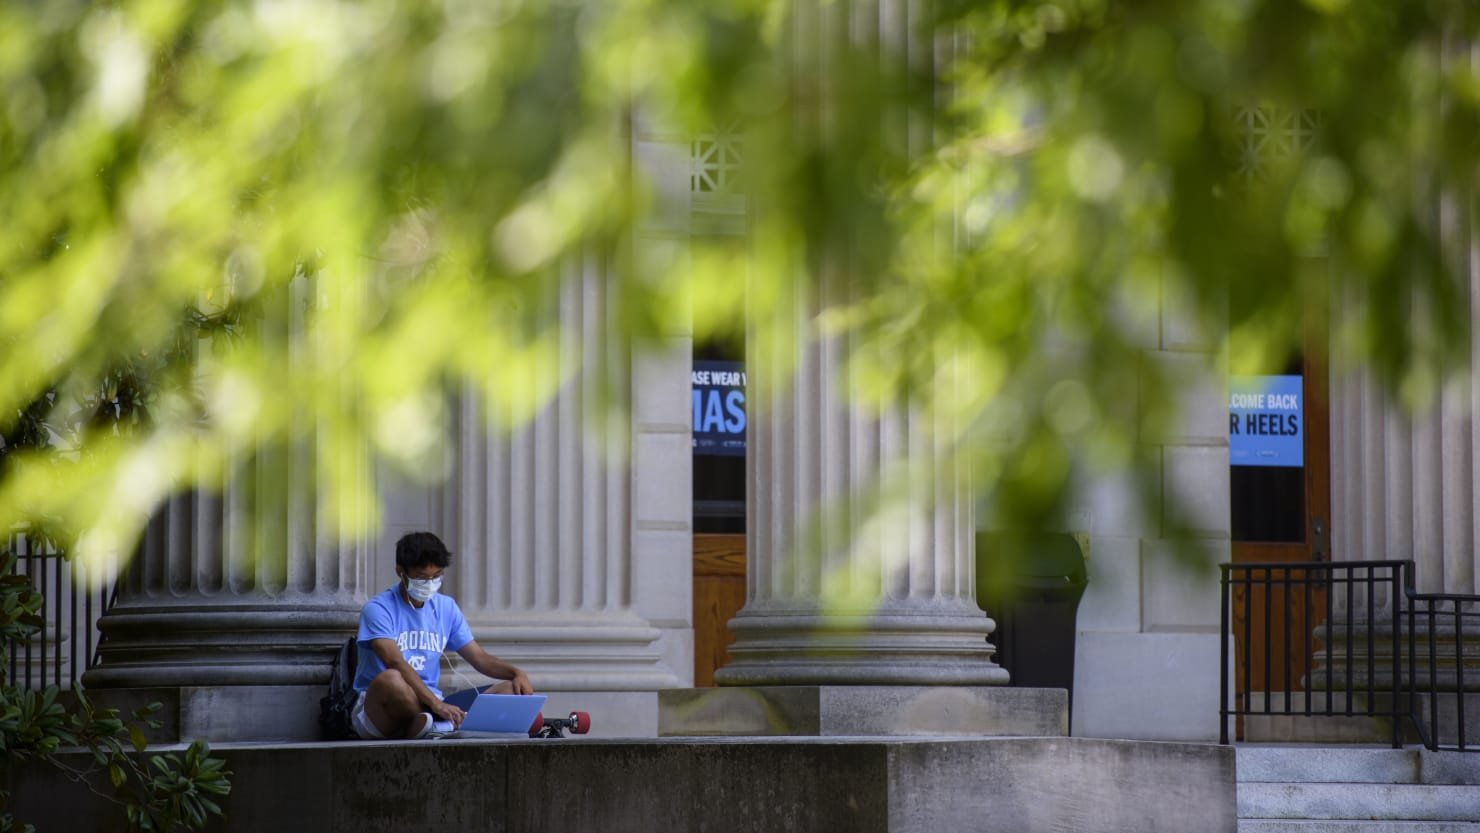 'Increasingly Alarming': Coronavirus Is Swamping Campuses Weeks After Reopening